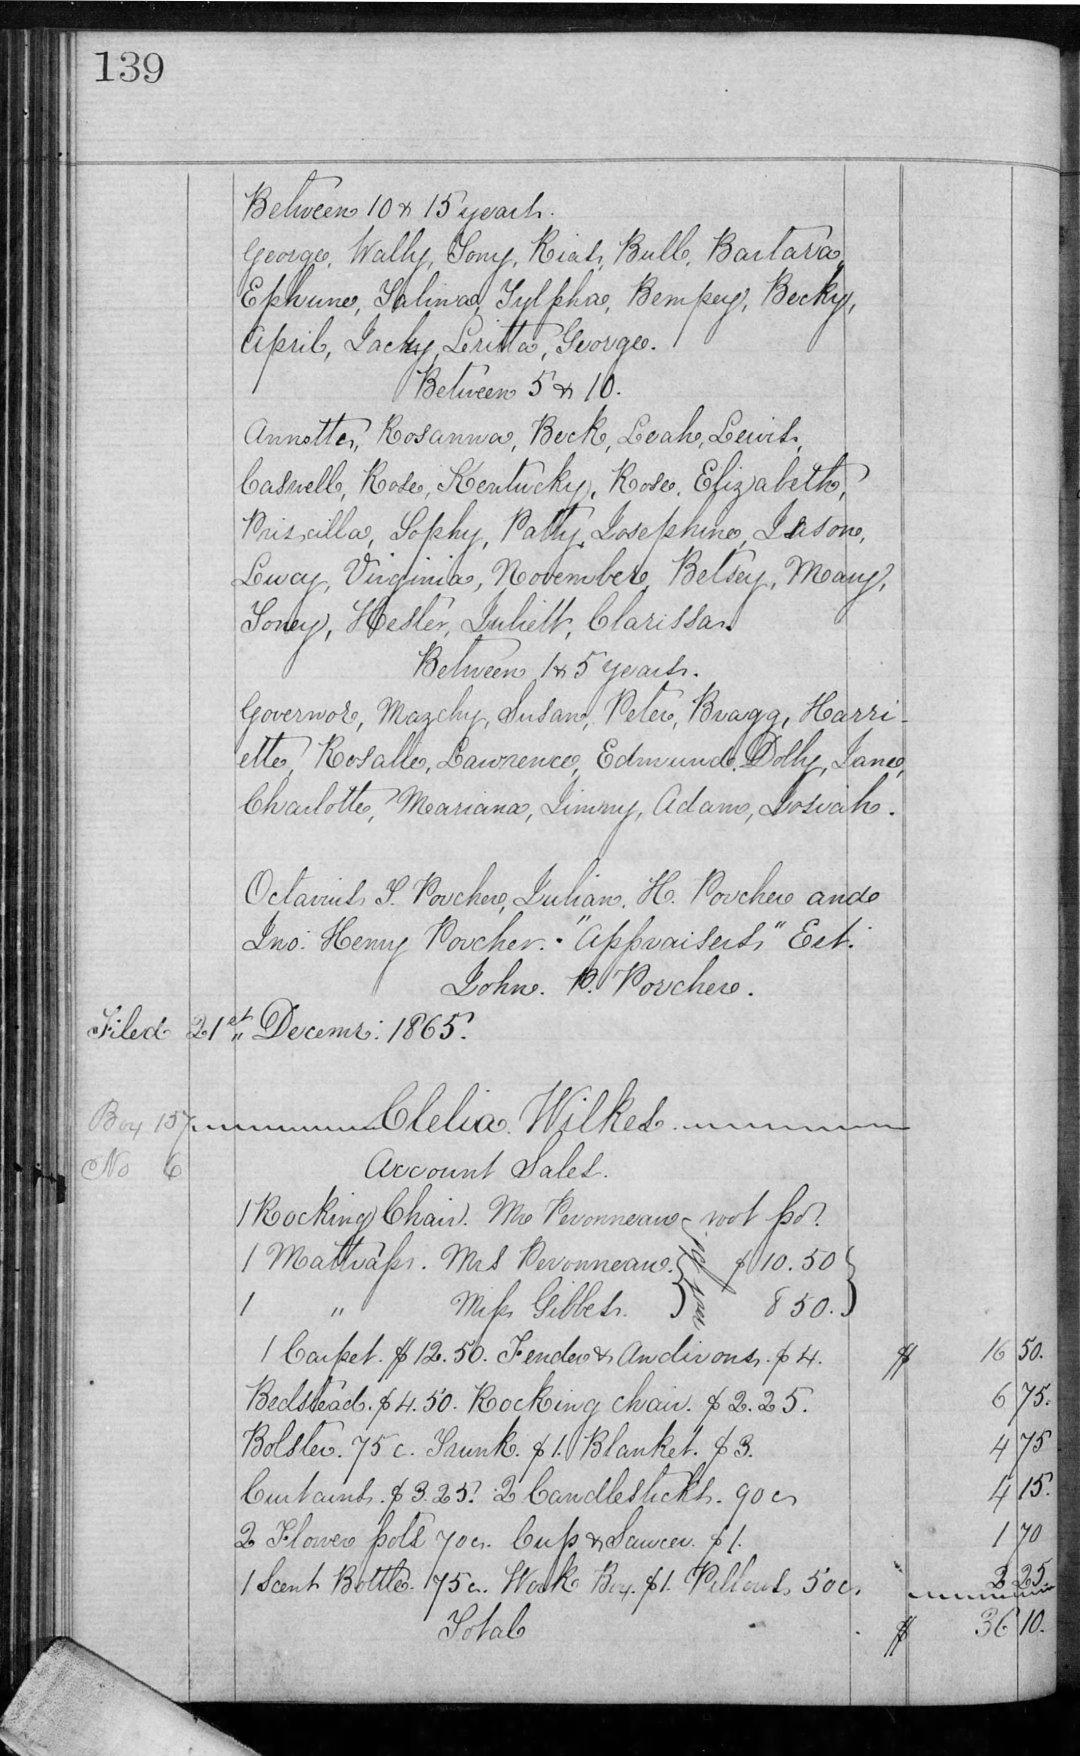 Porcher John P Est Inv Book G (1864-67) p139